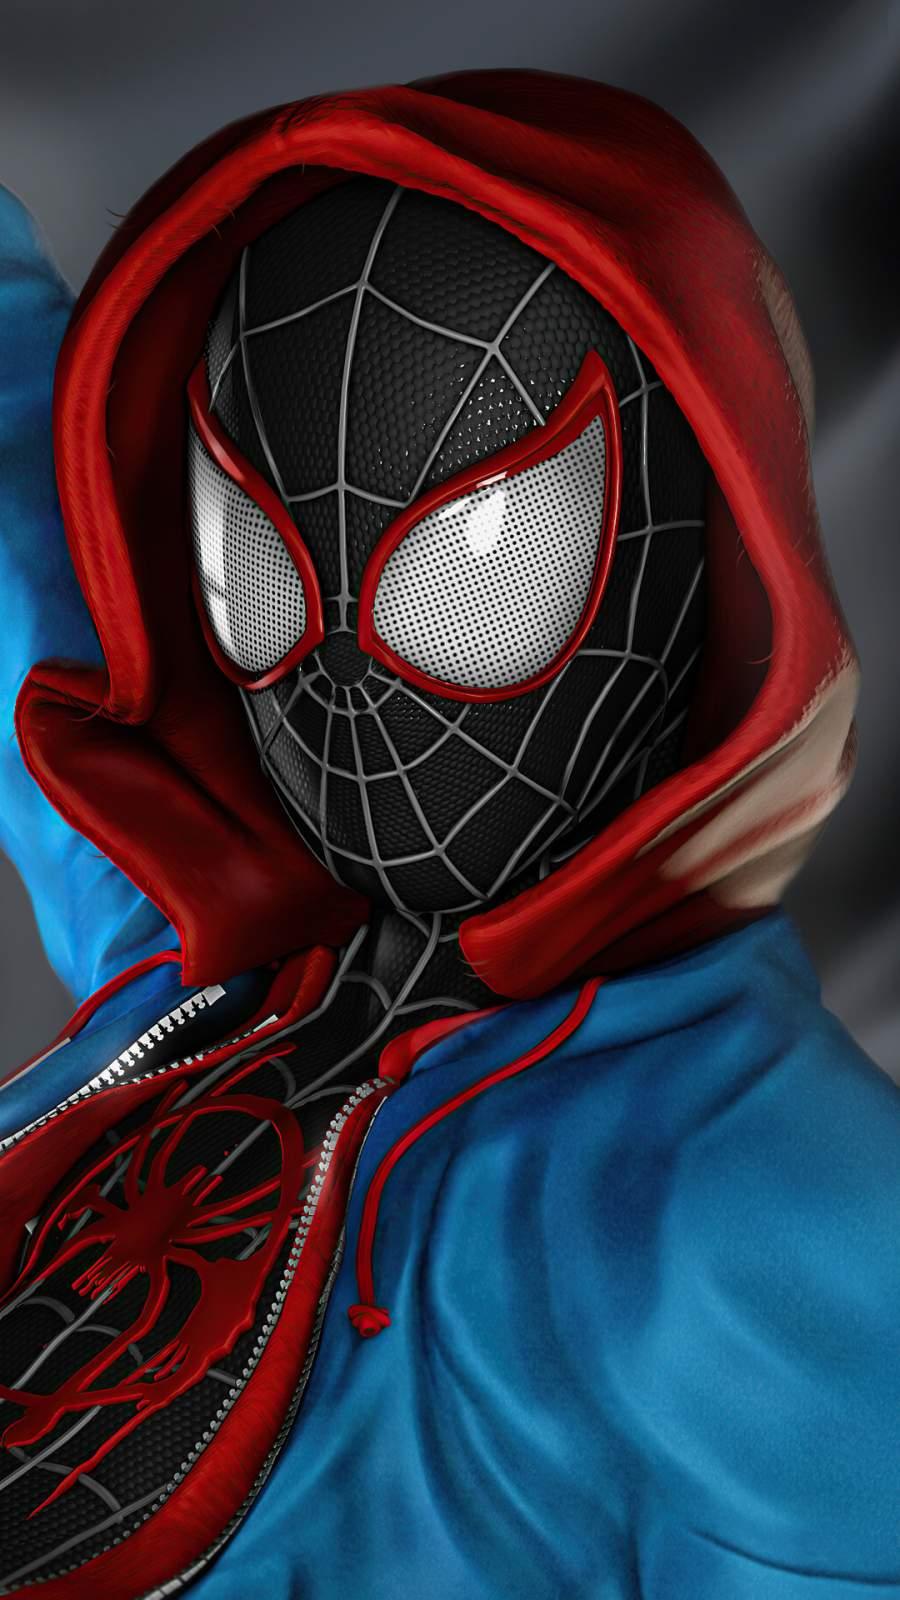 Spider Man miles morales costume